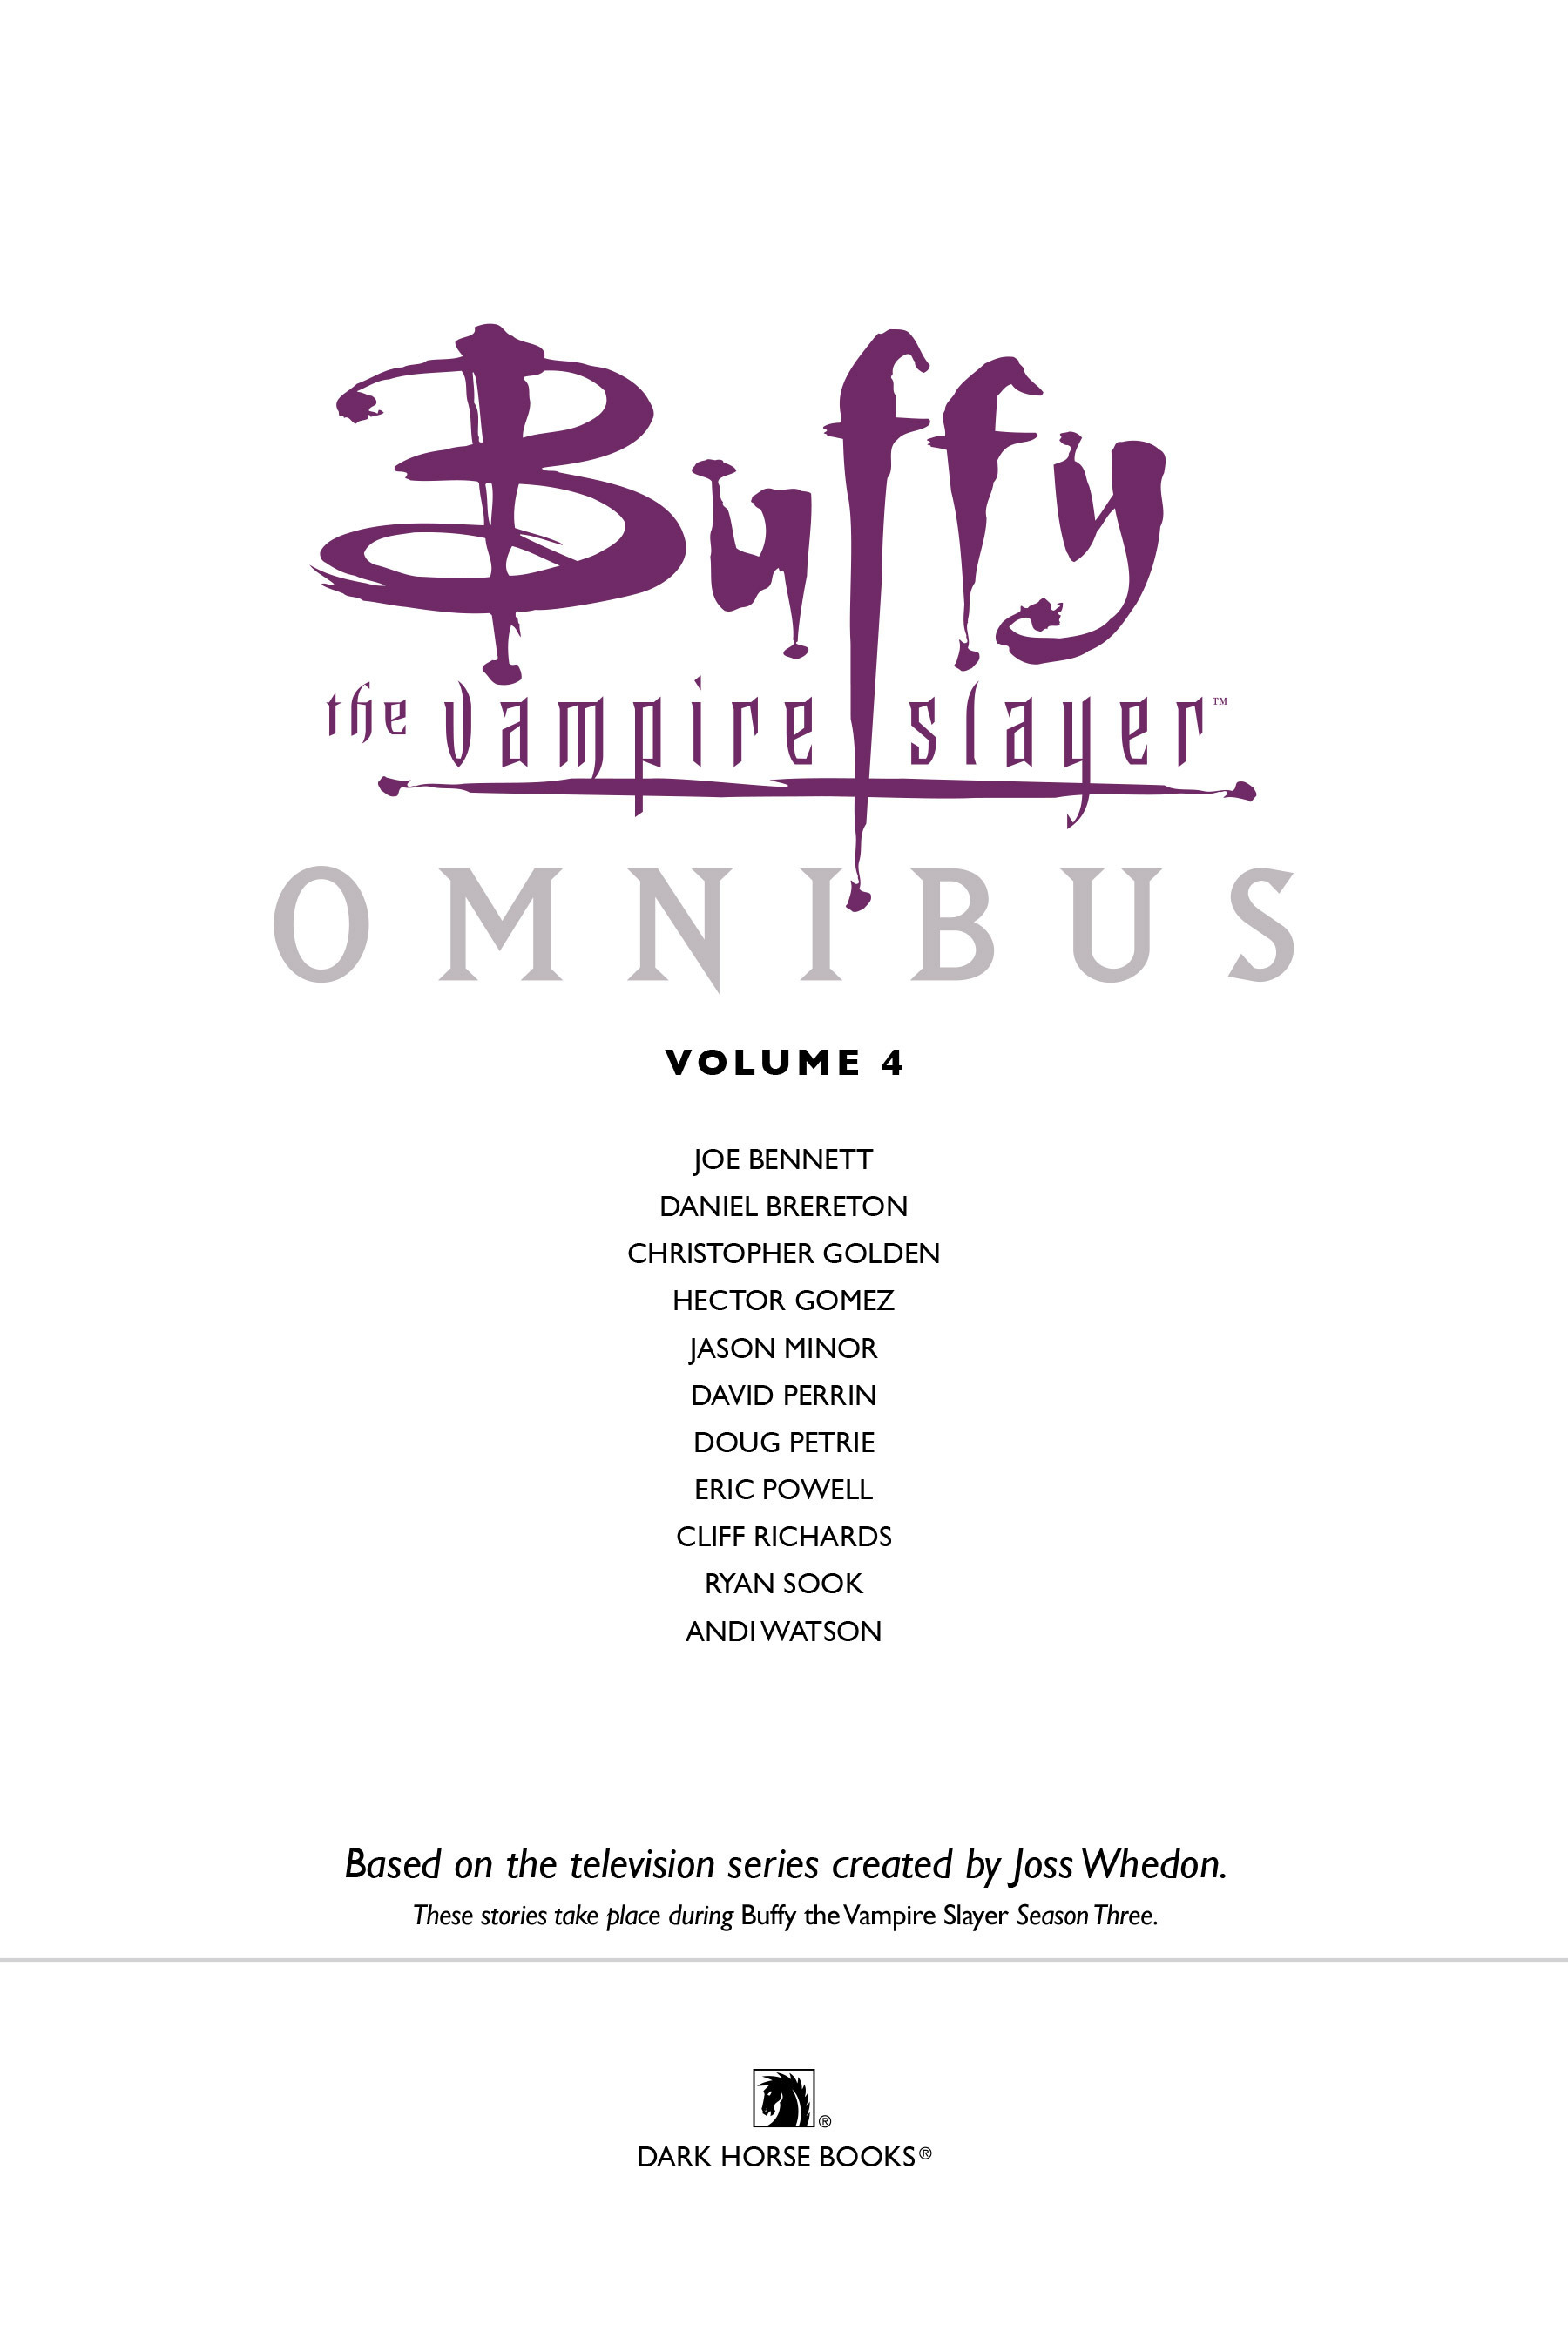 Read online Buffy the Vampire Slayer: Omnibus comic -  Issue # TPB 4 - 4